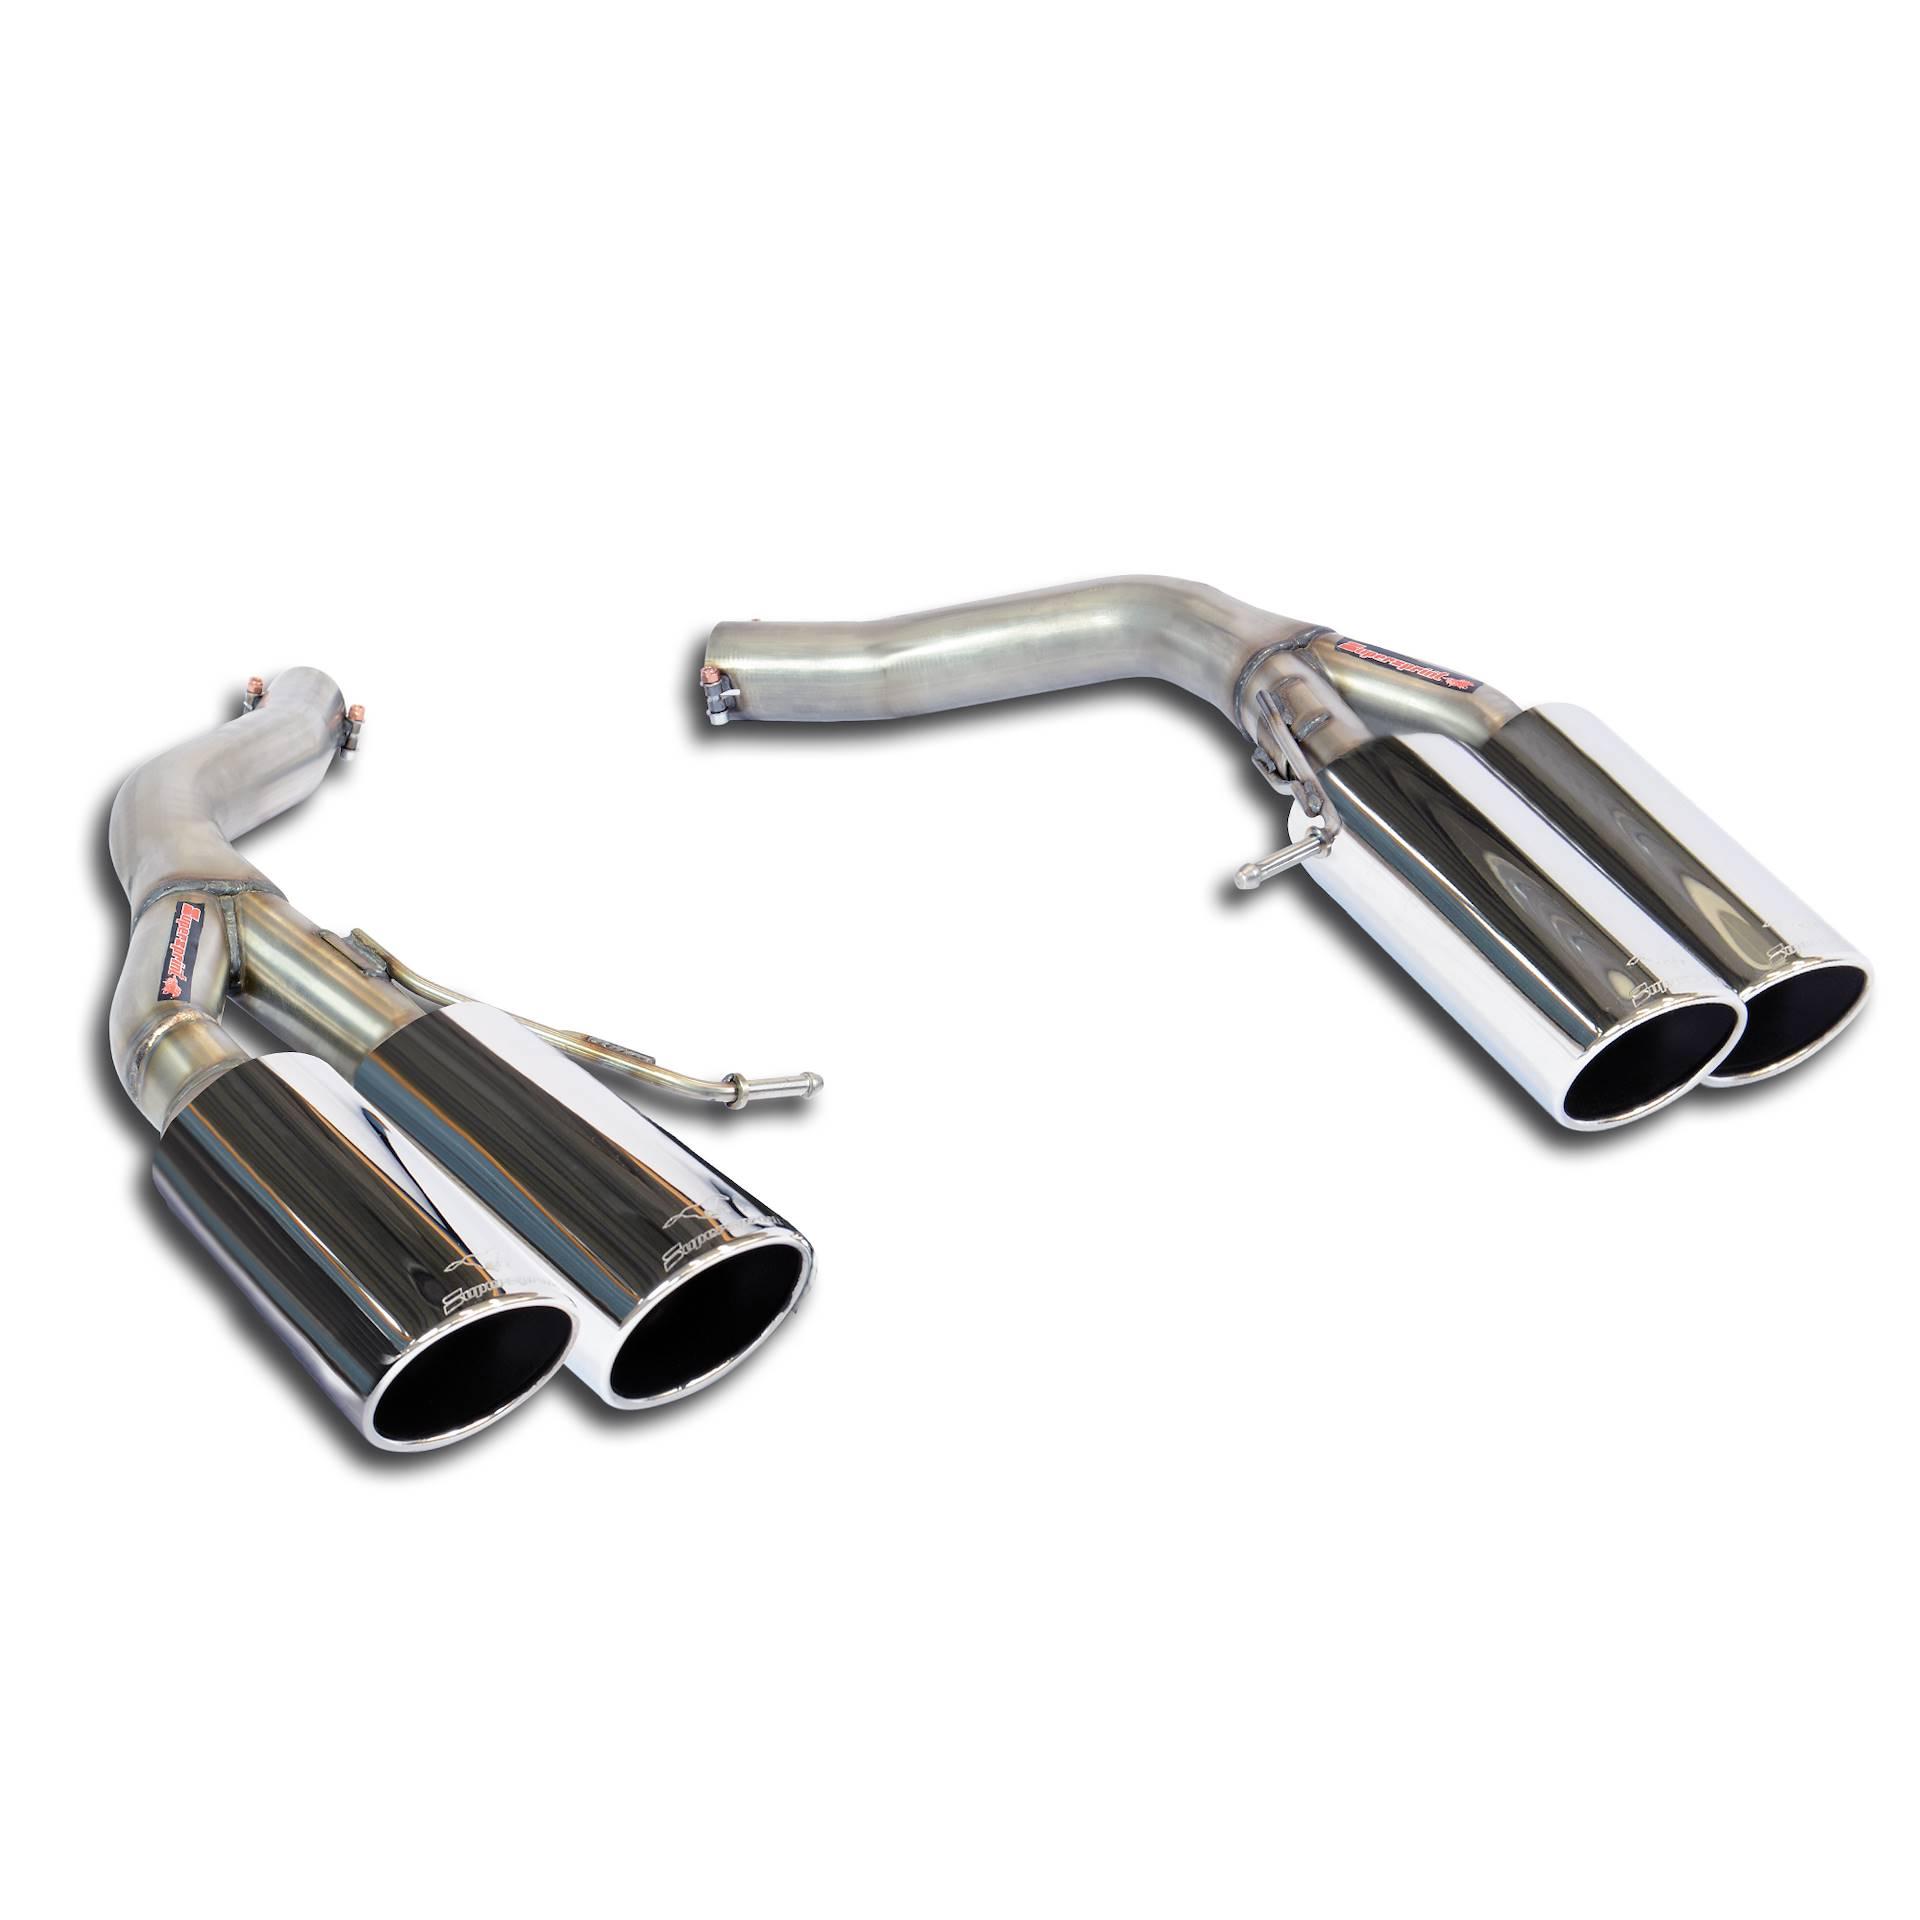 Performance sport exhaust for BMW F10 - F11 550i, BMW F10